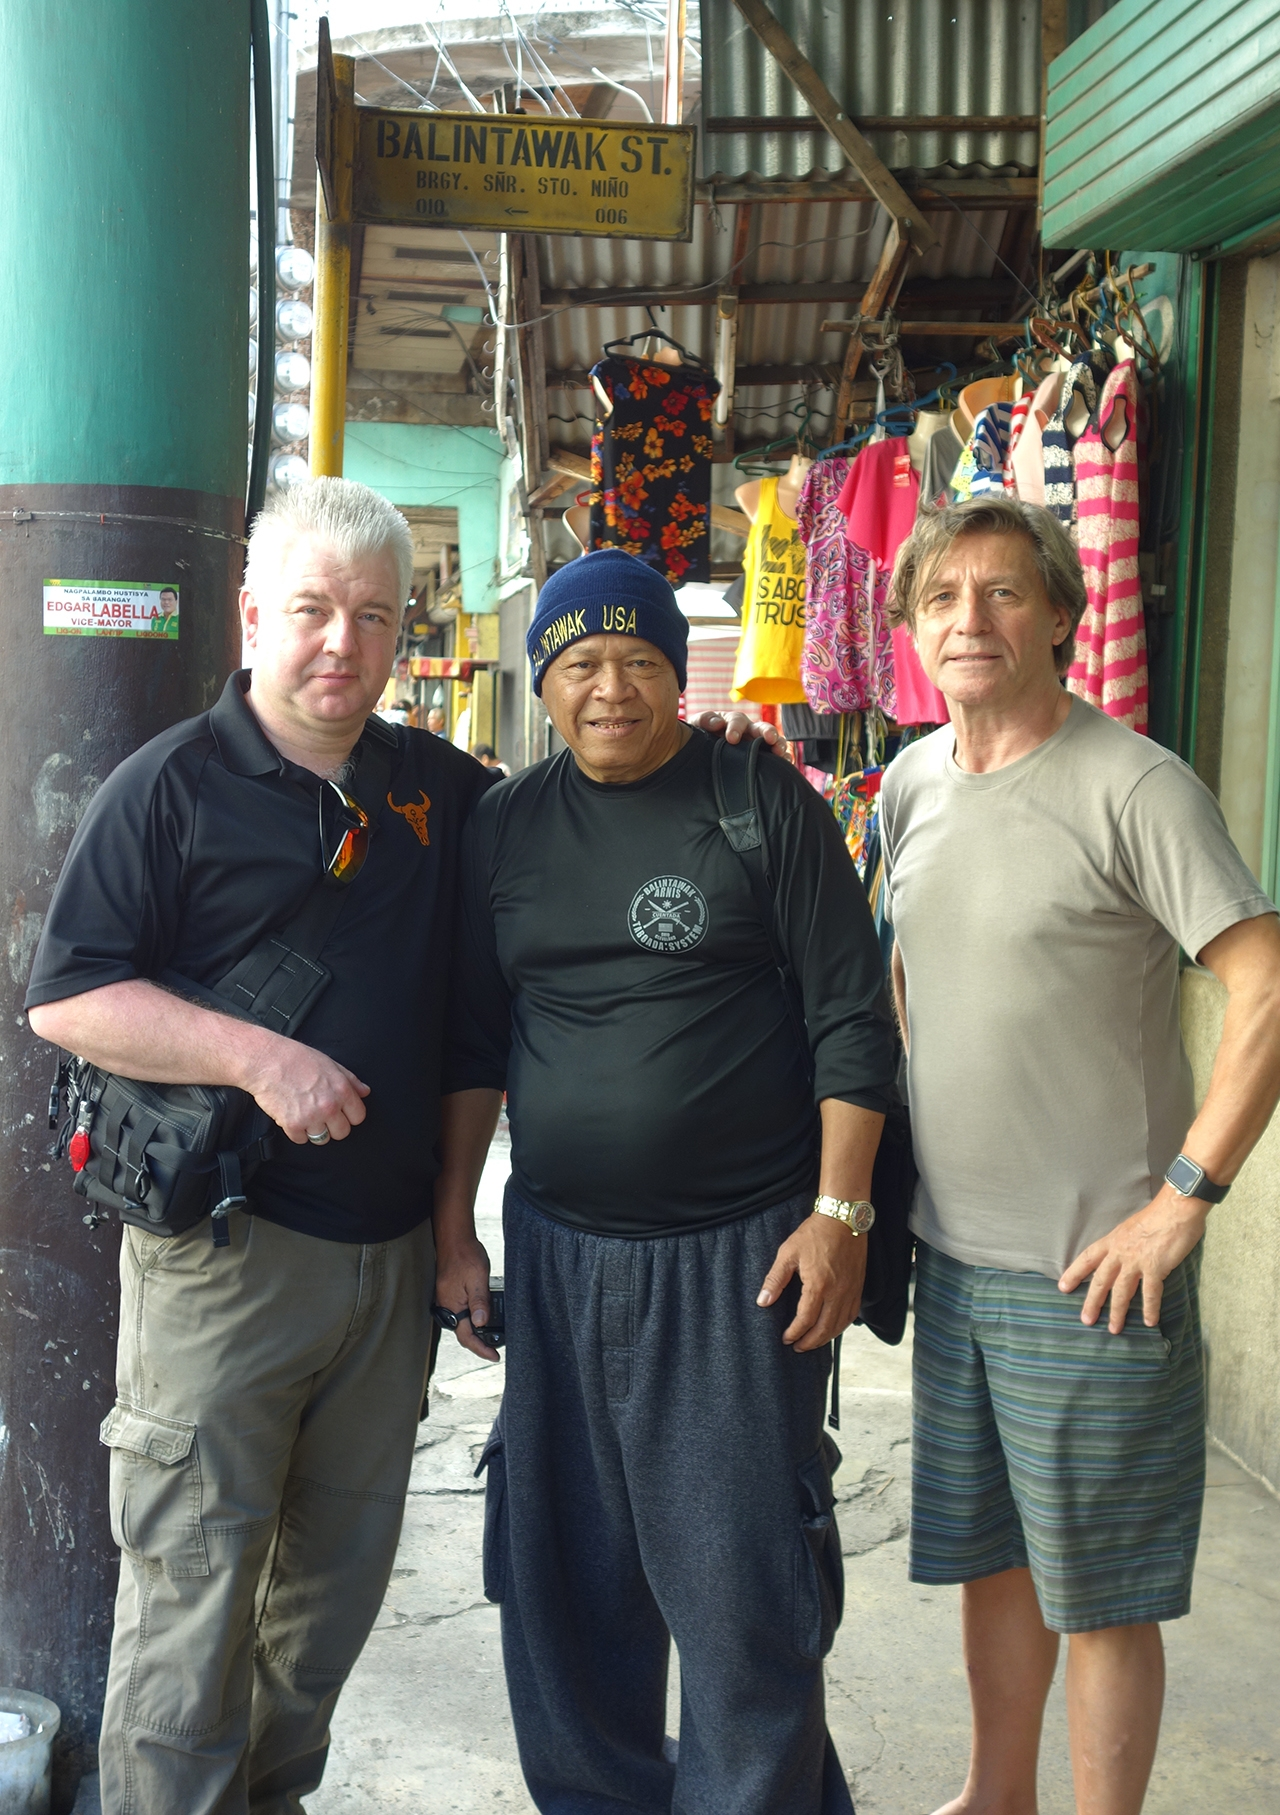 Arnis masters Bobby Taboada and Tim Hartman on Balintawak Street, Philippines